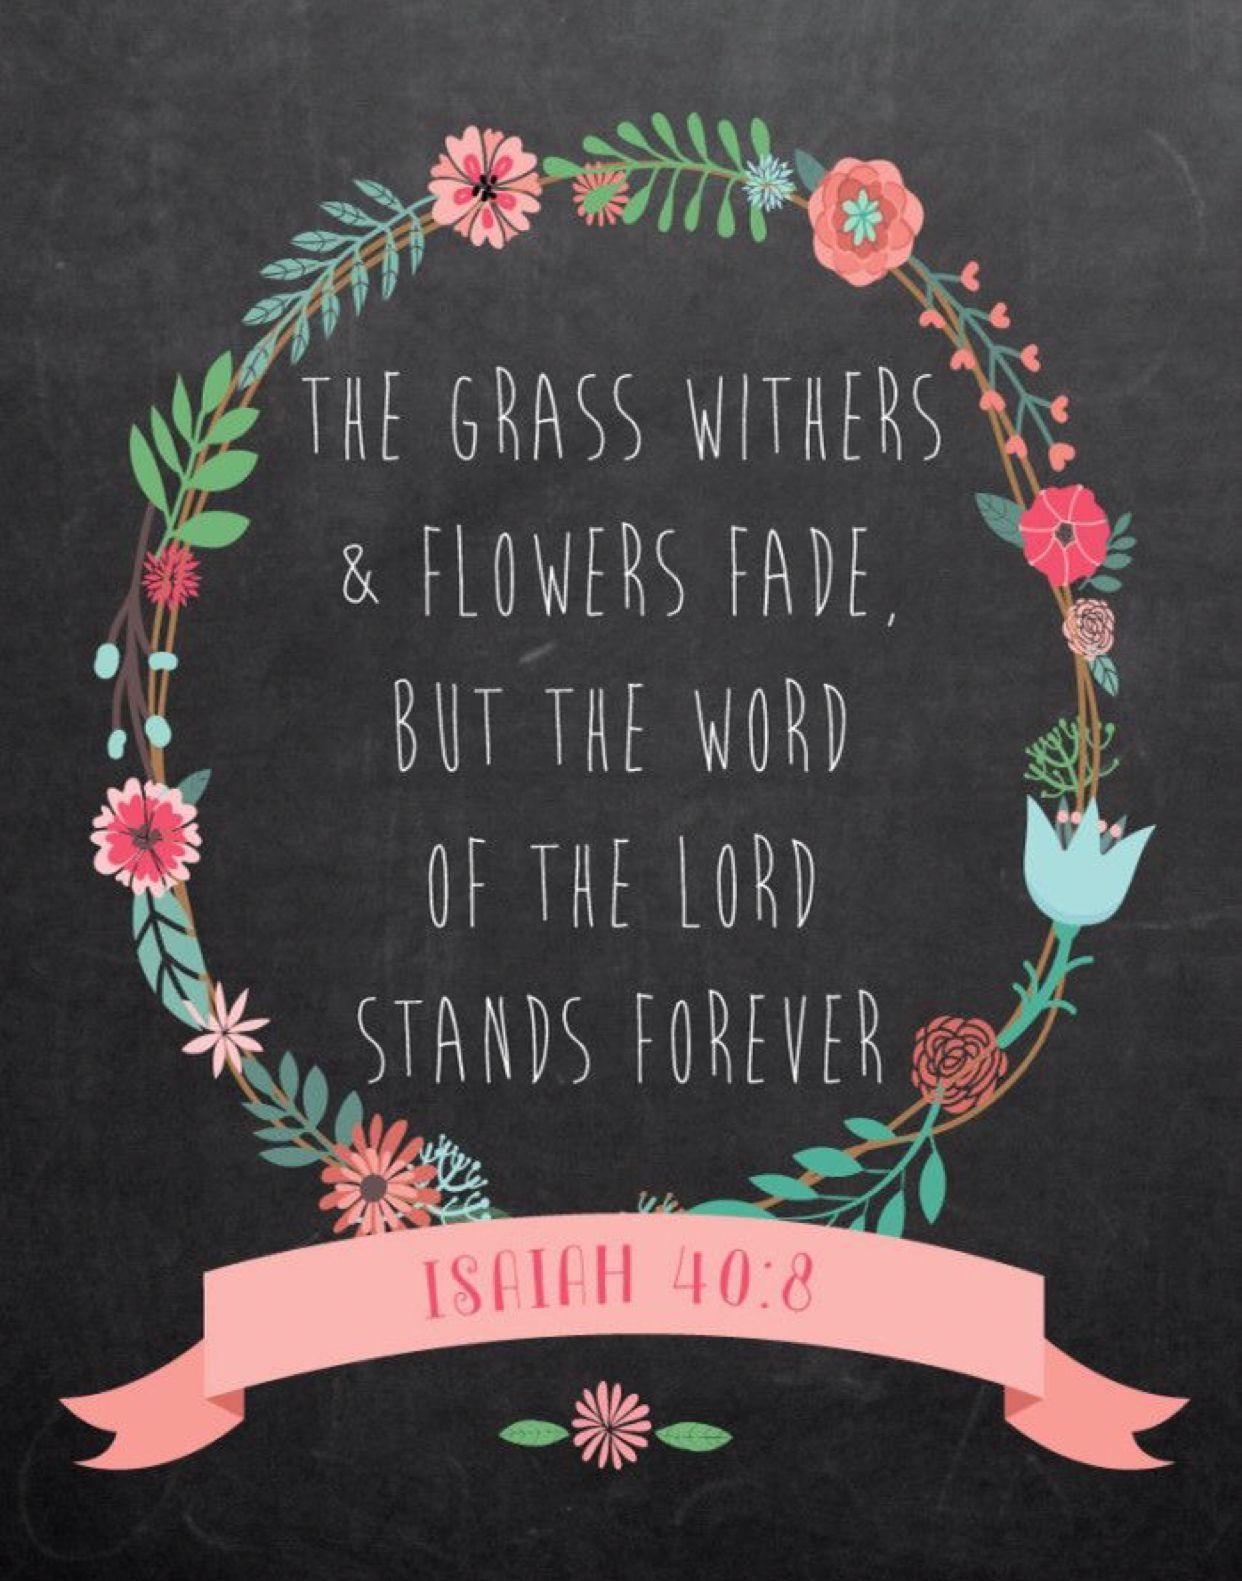 Isaiah 40 8